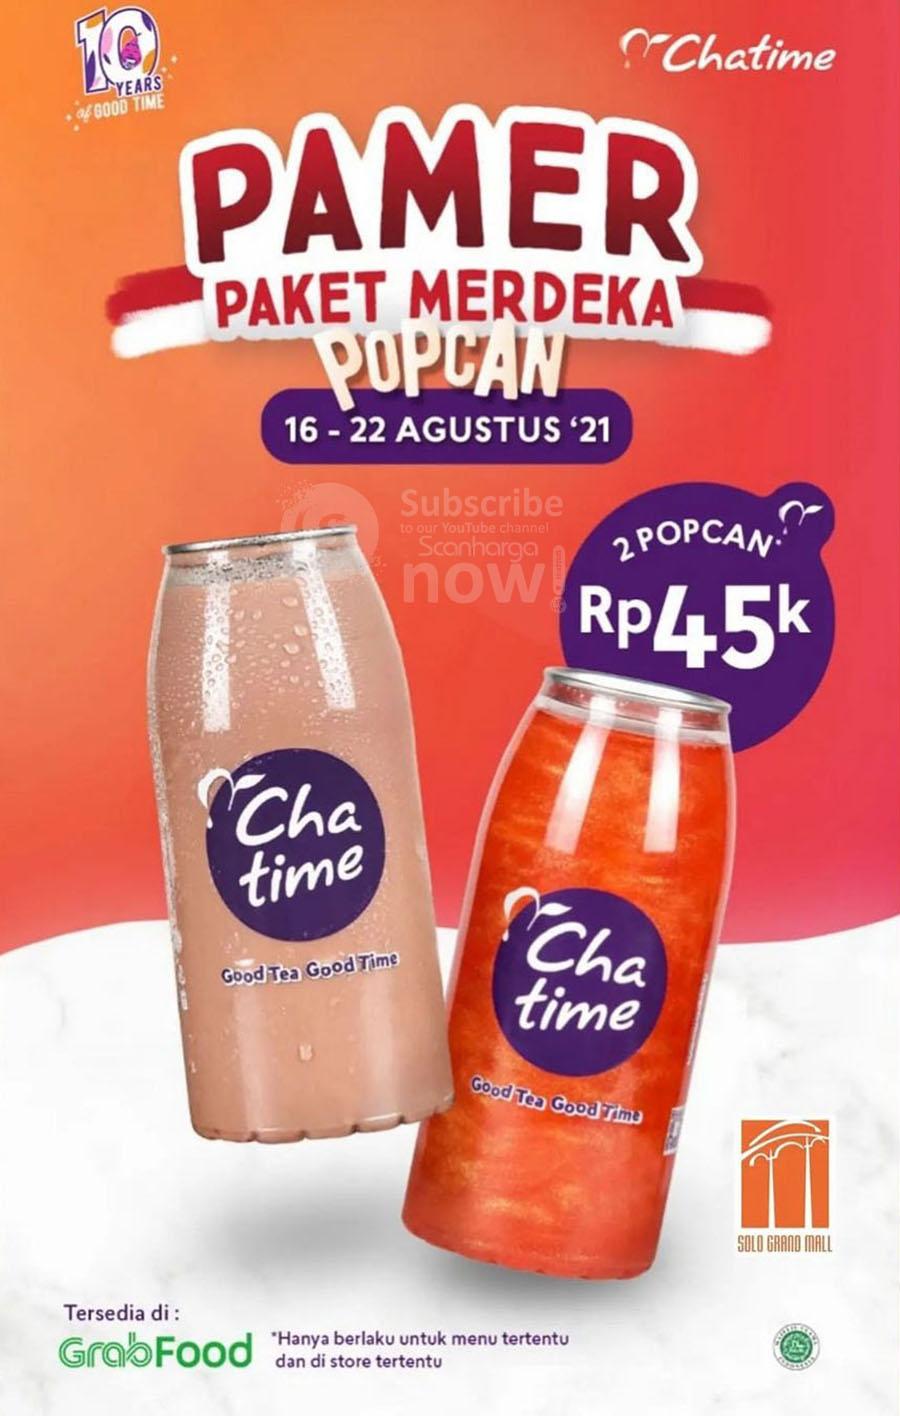 Chatime Promo Paket Merdeka Grabfood - 2 Chatime hanya Rp. 45.000 2